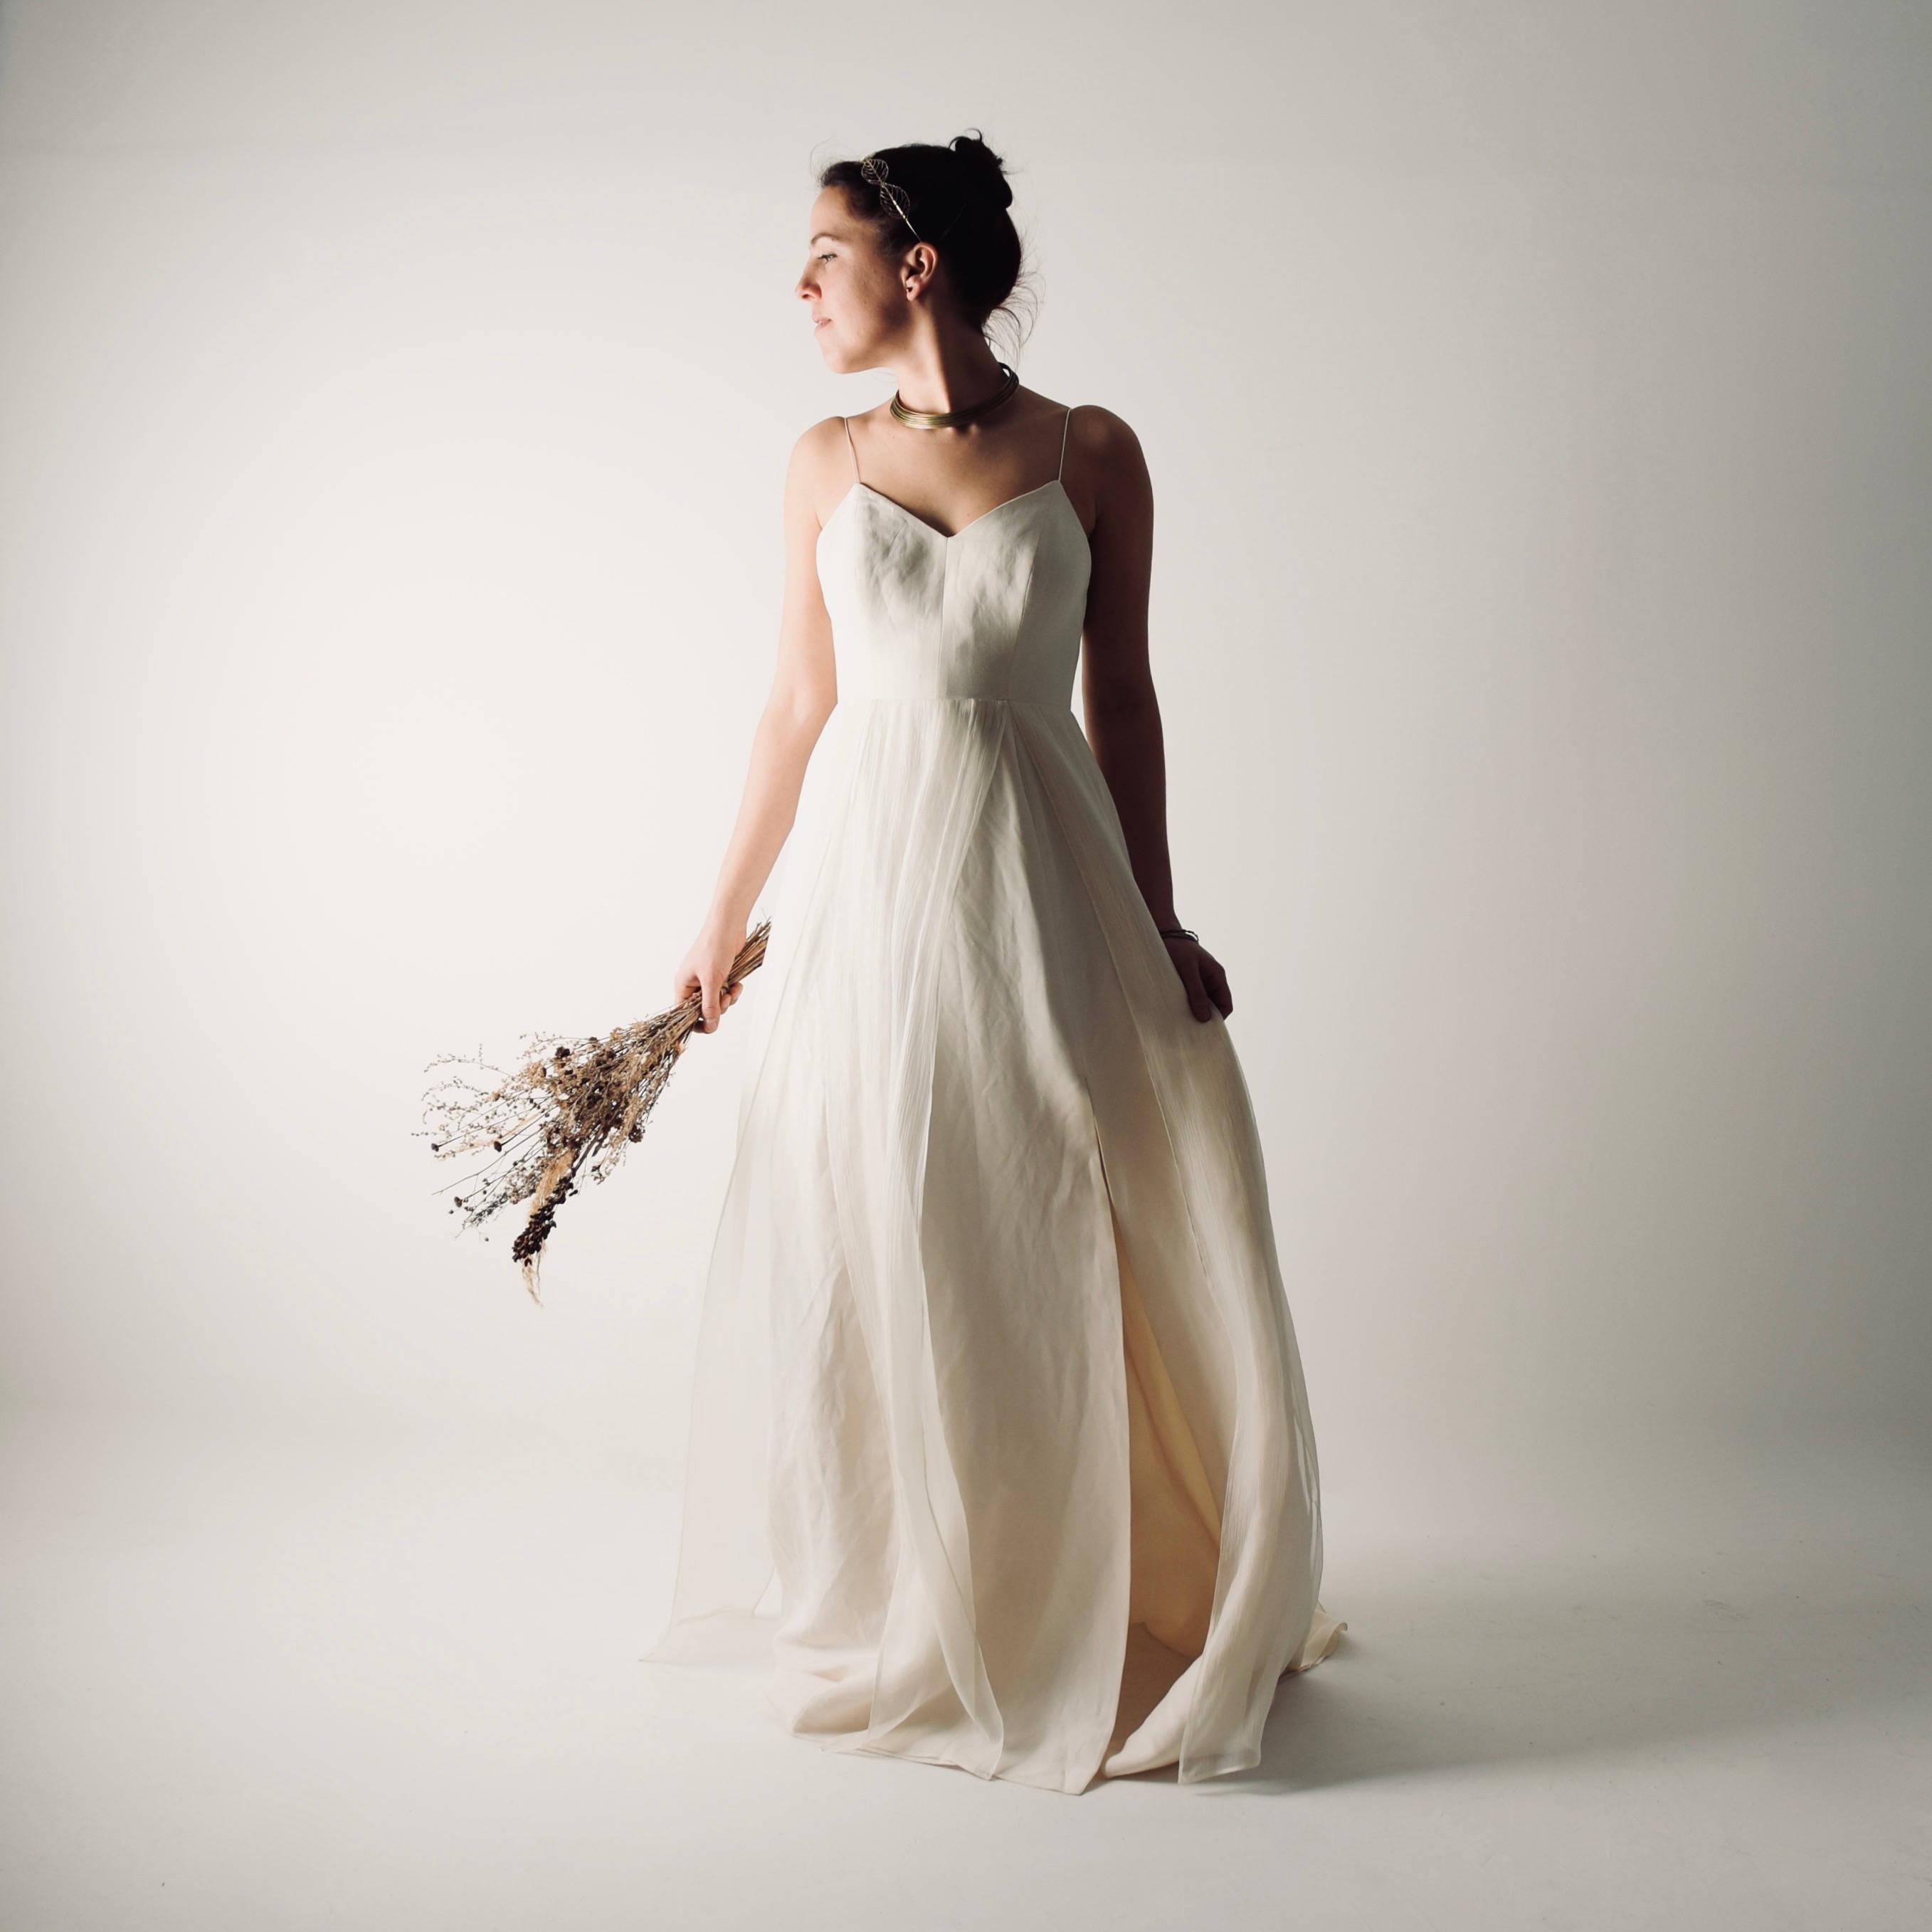 Linen Modern Wedding Dress Echinacea Gt Gt Larimeloom